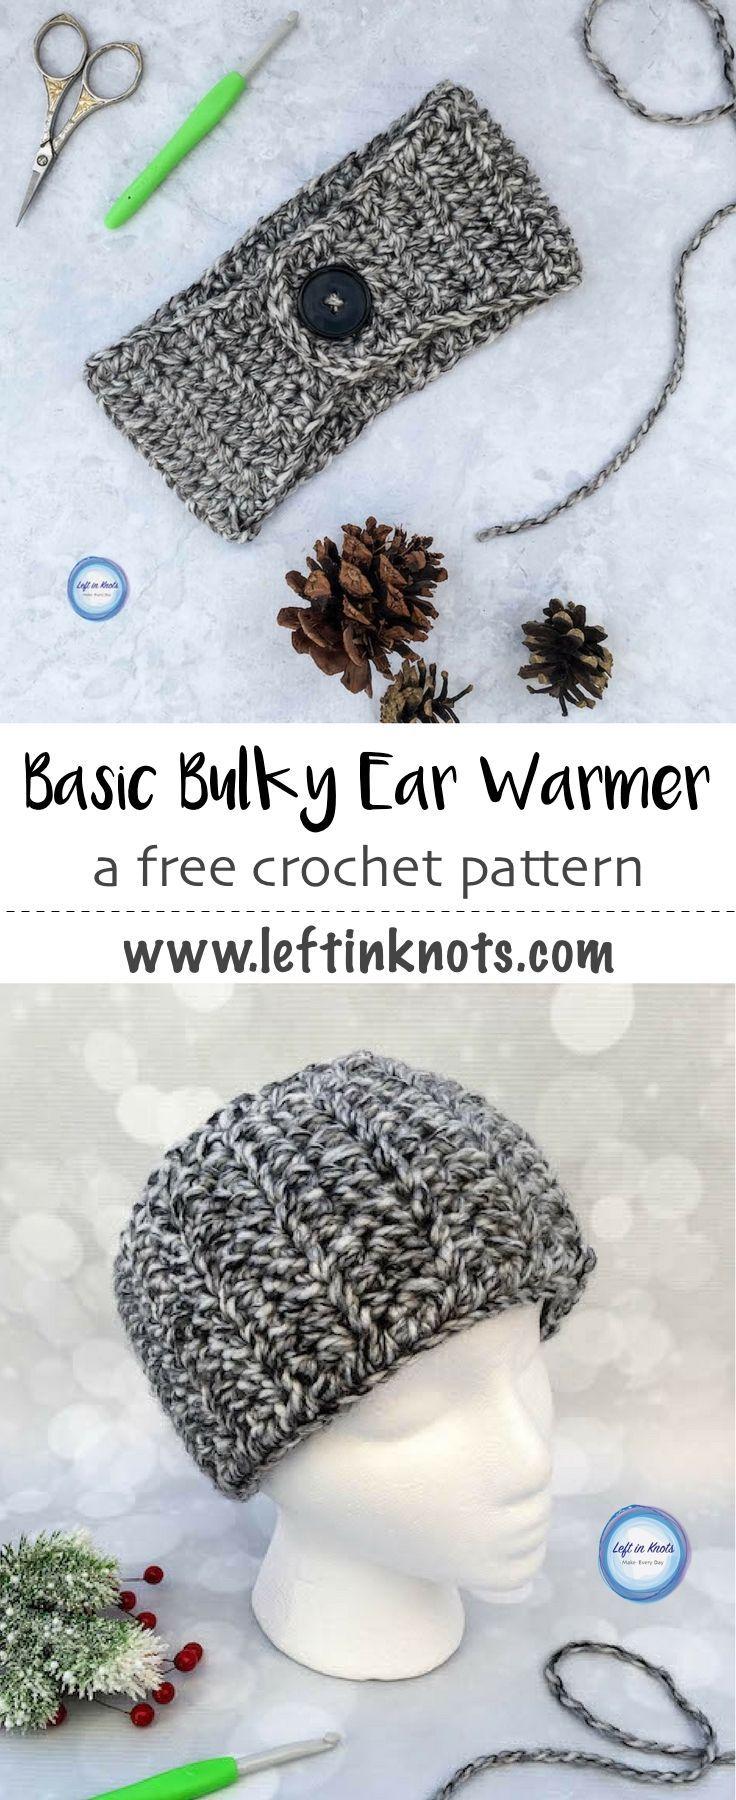 Basic Bulky Ear Warmer Pattern PLUS Crochet for a Good Cause